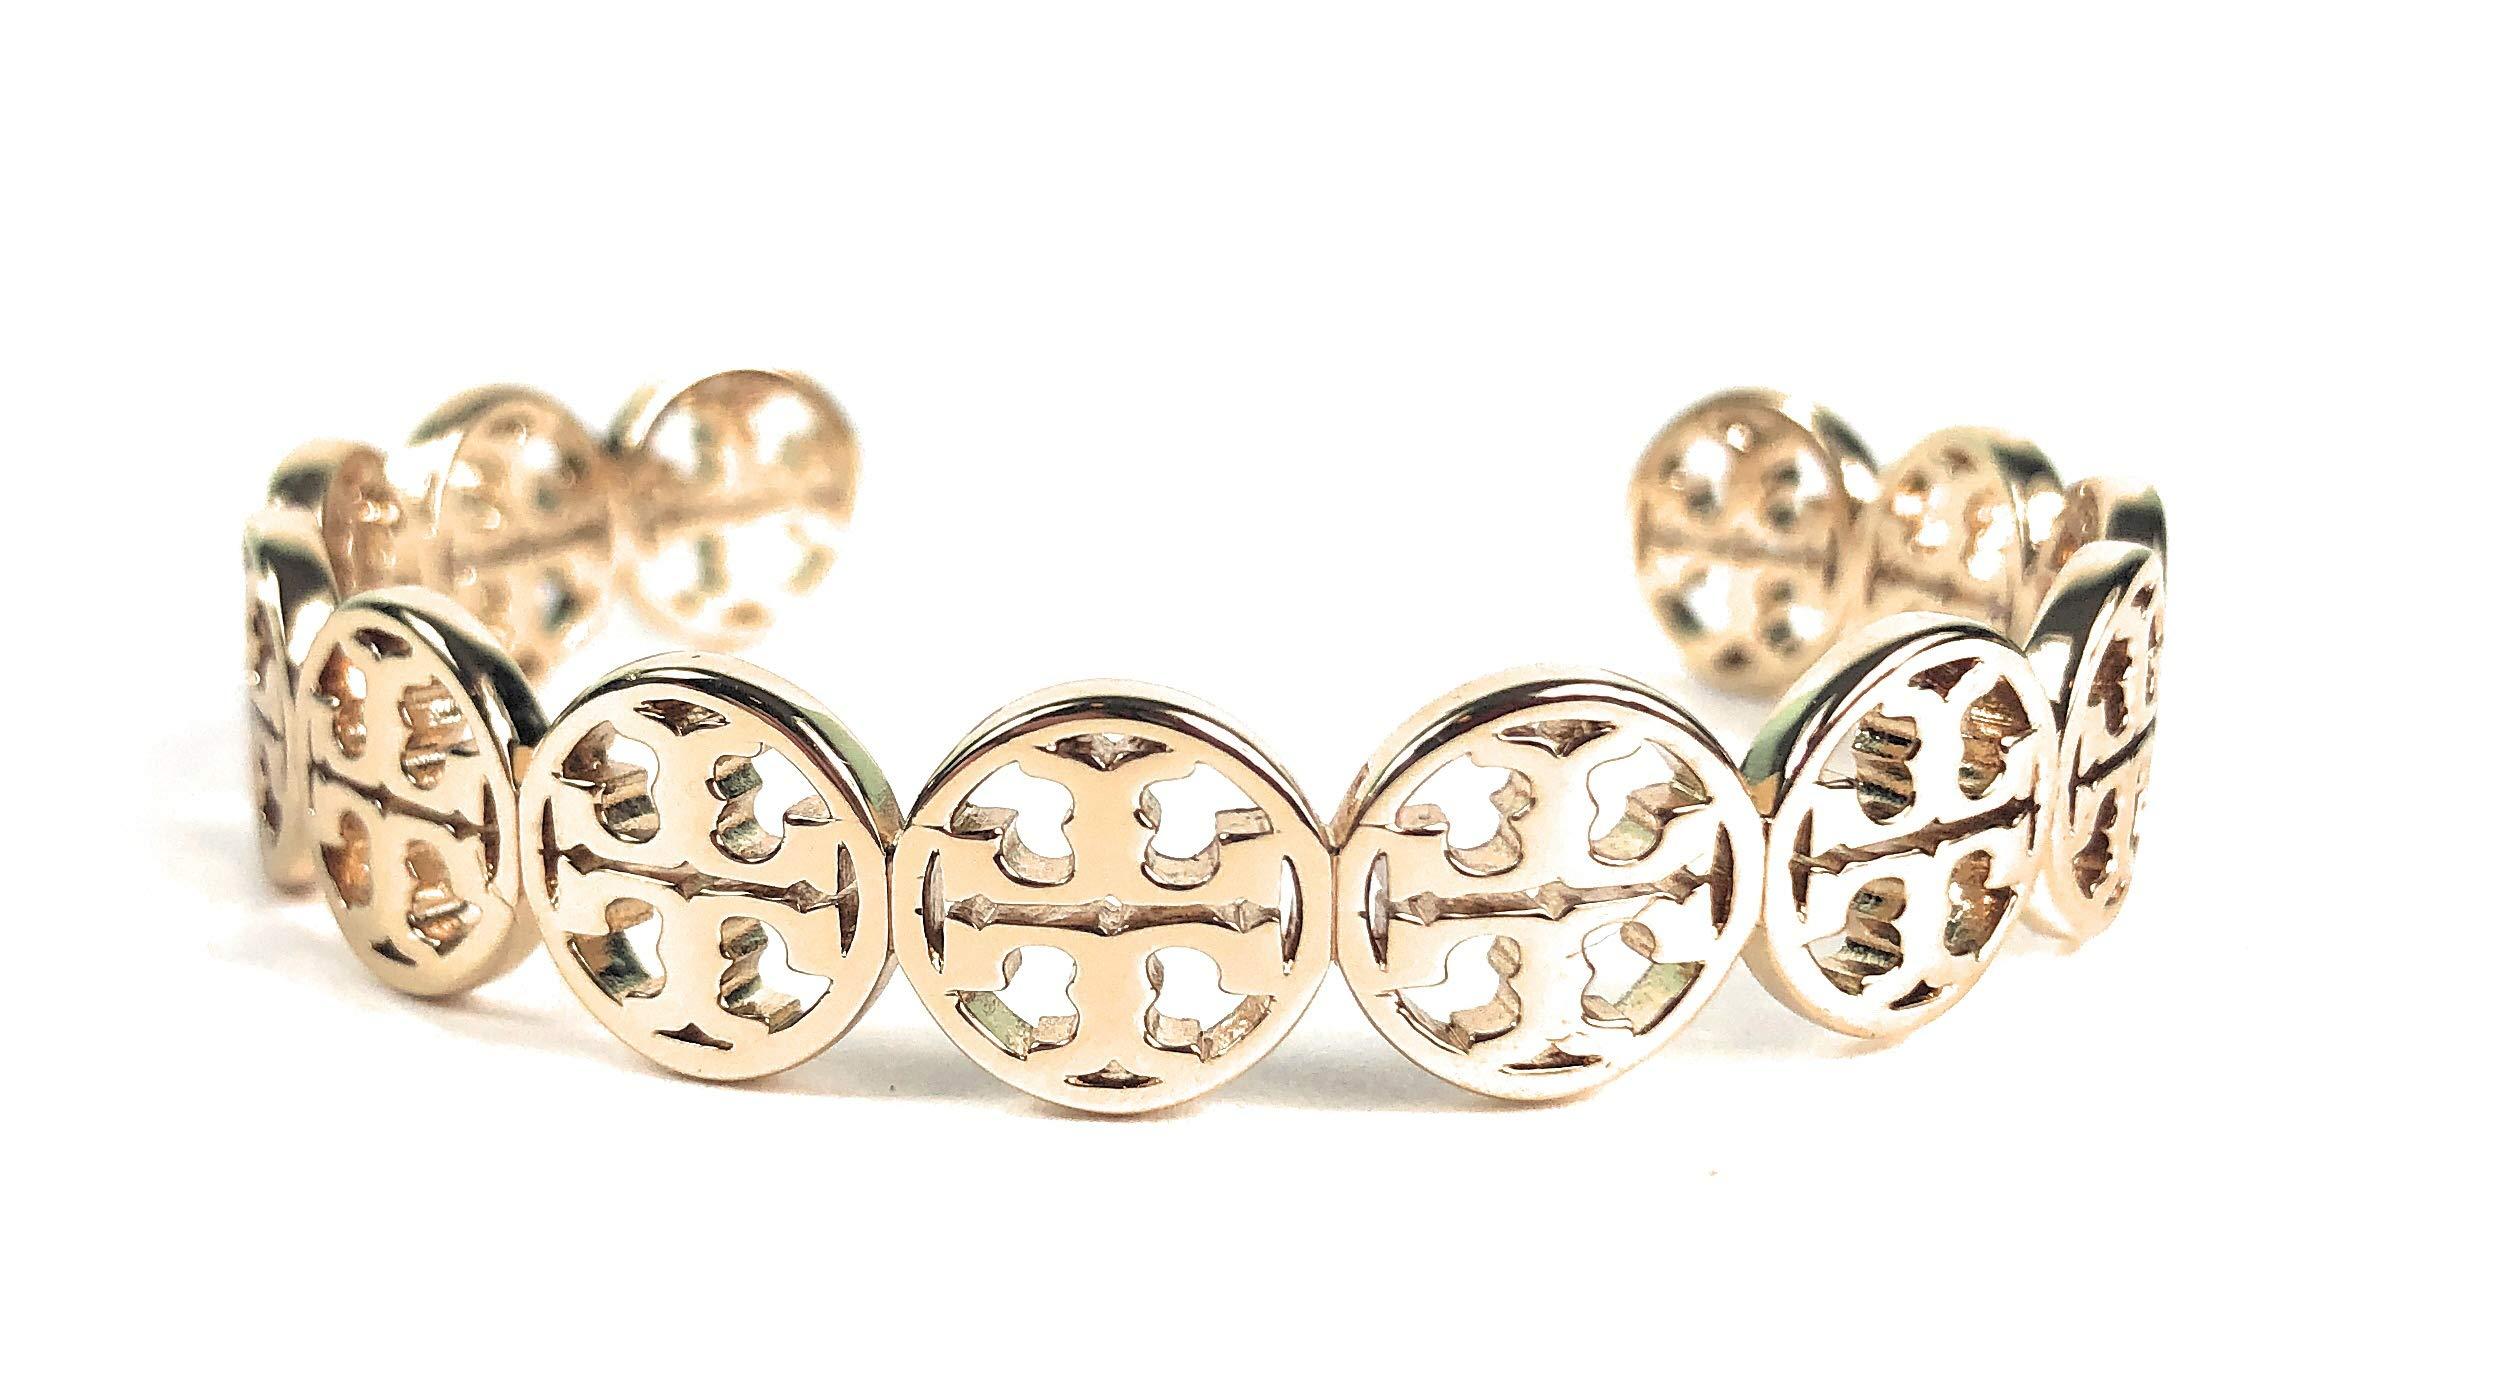 Tory Burch Frozen Logo Cuff Bracelet Goldtone Womans by Tory Burch